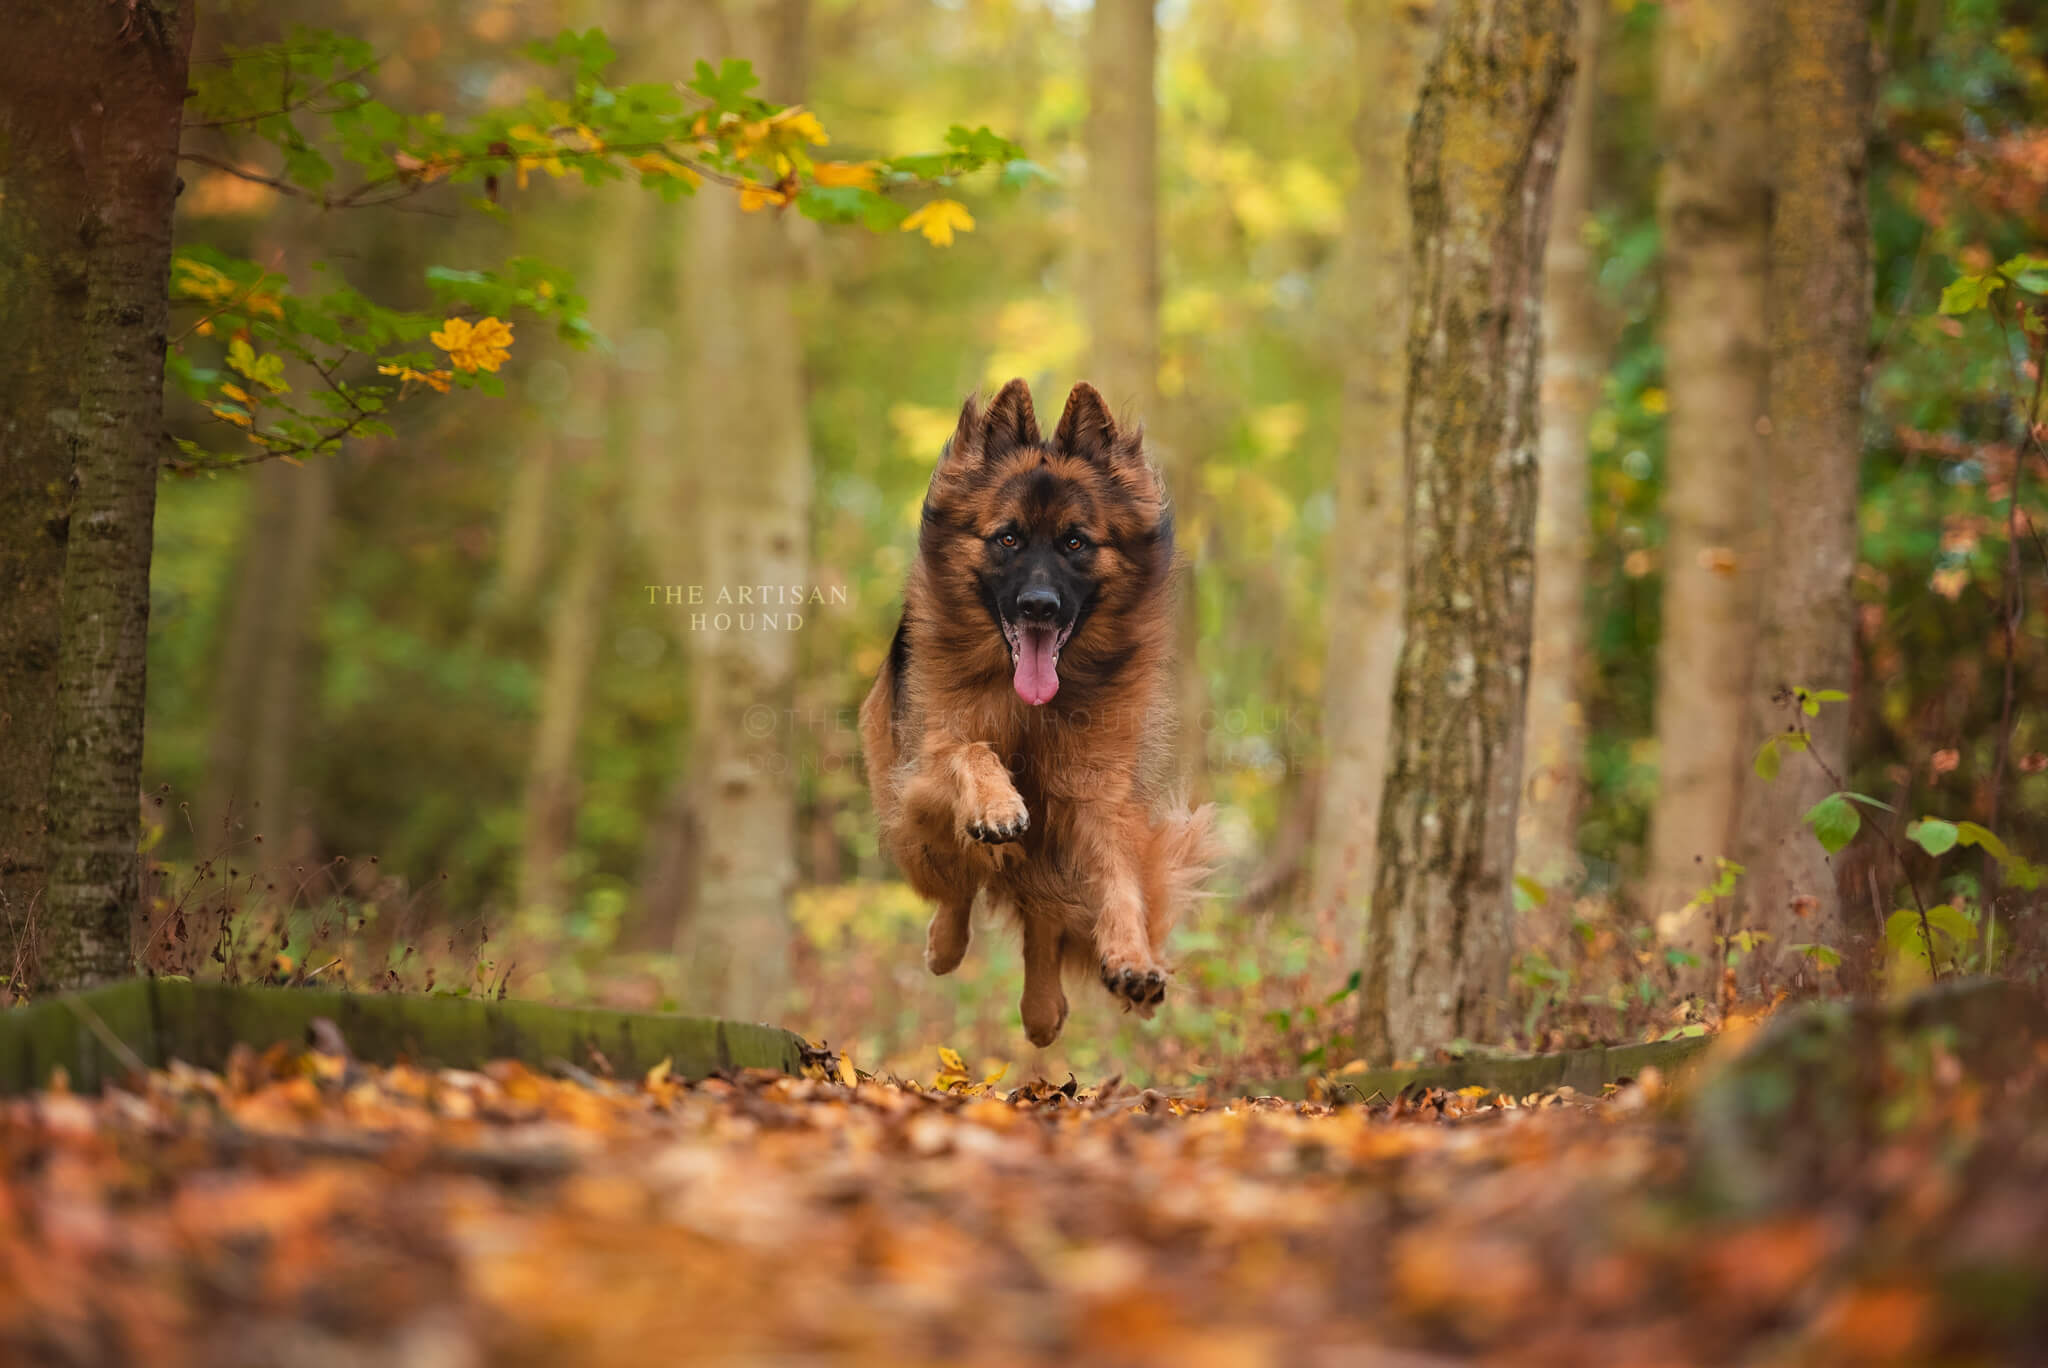 German Shepherd running through autumn woodlands in Northamptonshire